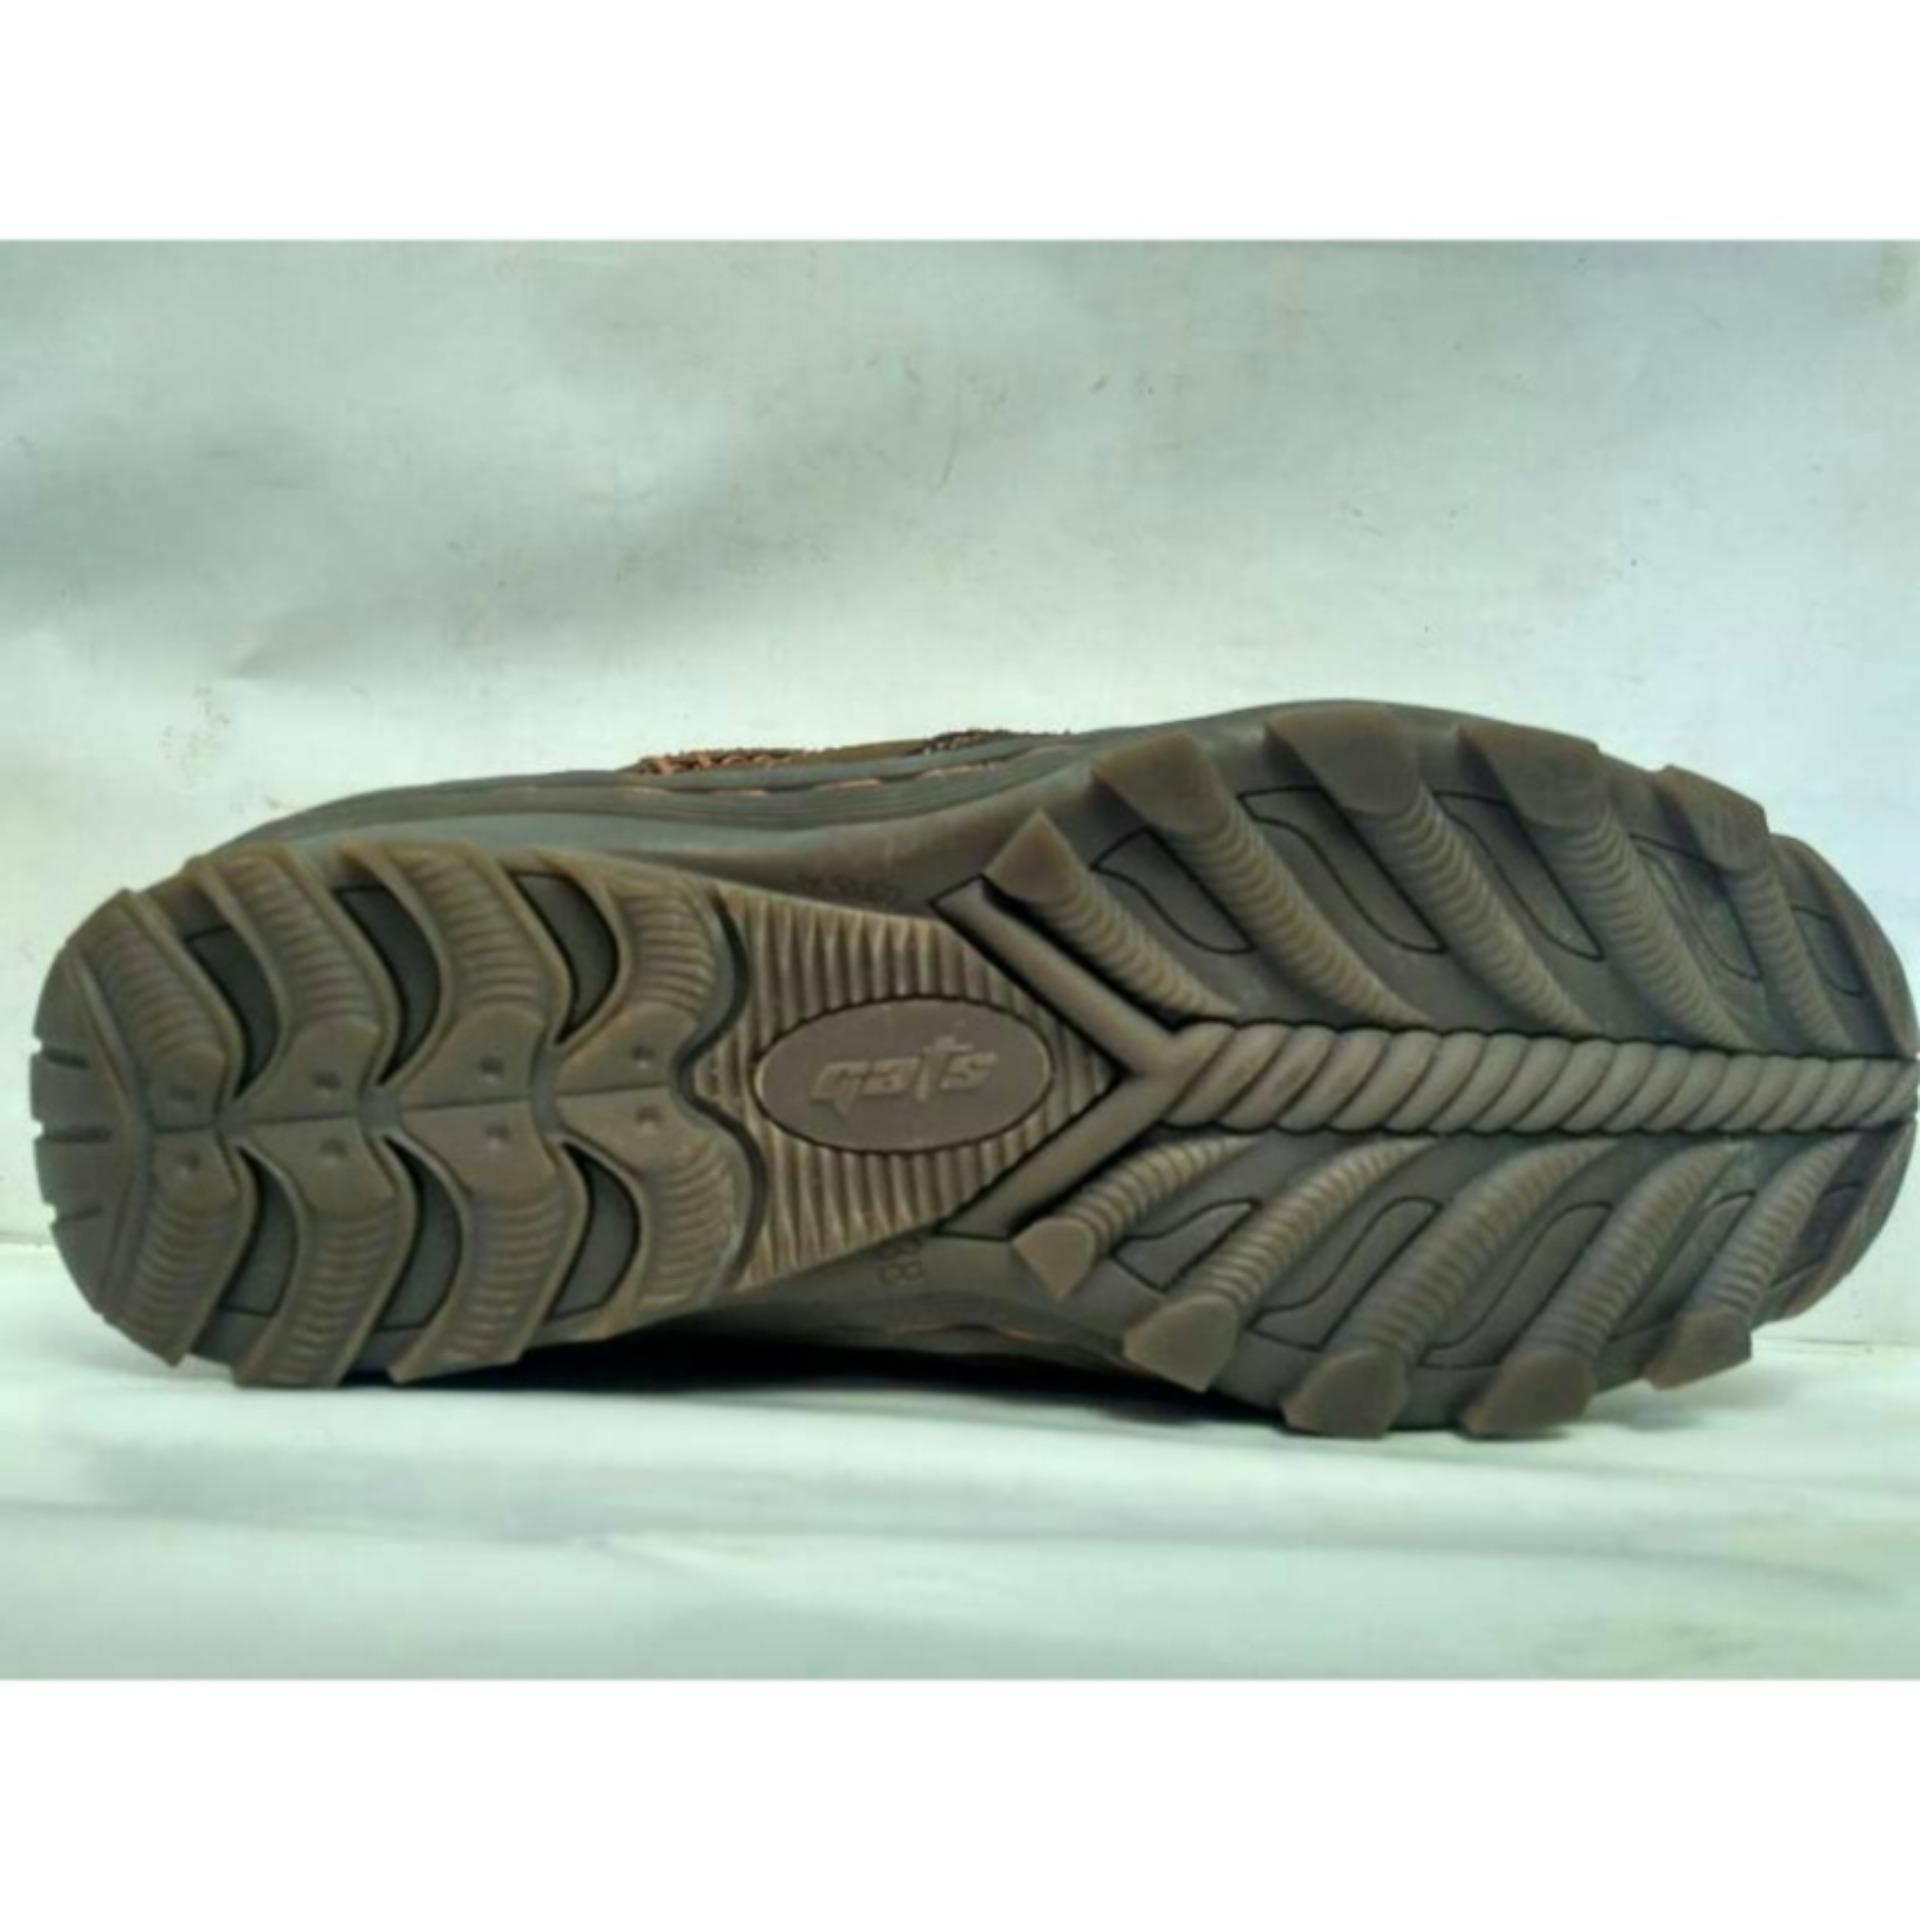 eShop Checker GATS SHOES Sepatu Kulit Pria To 2206 Brown Diskon ... 15f8083fa0